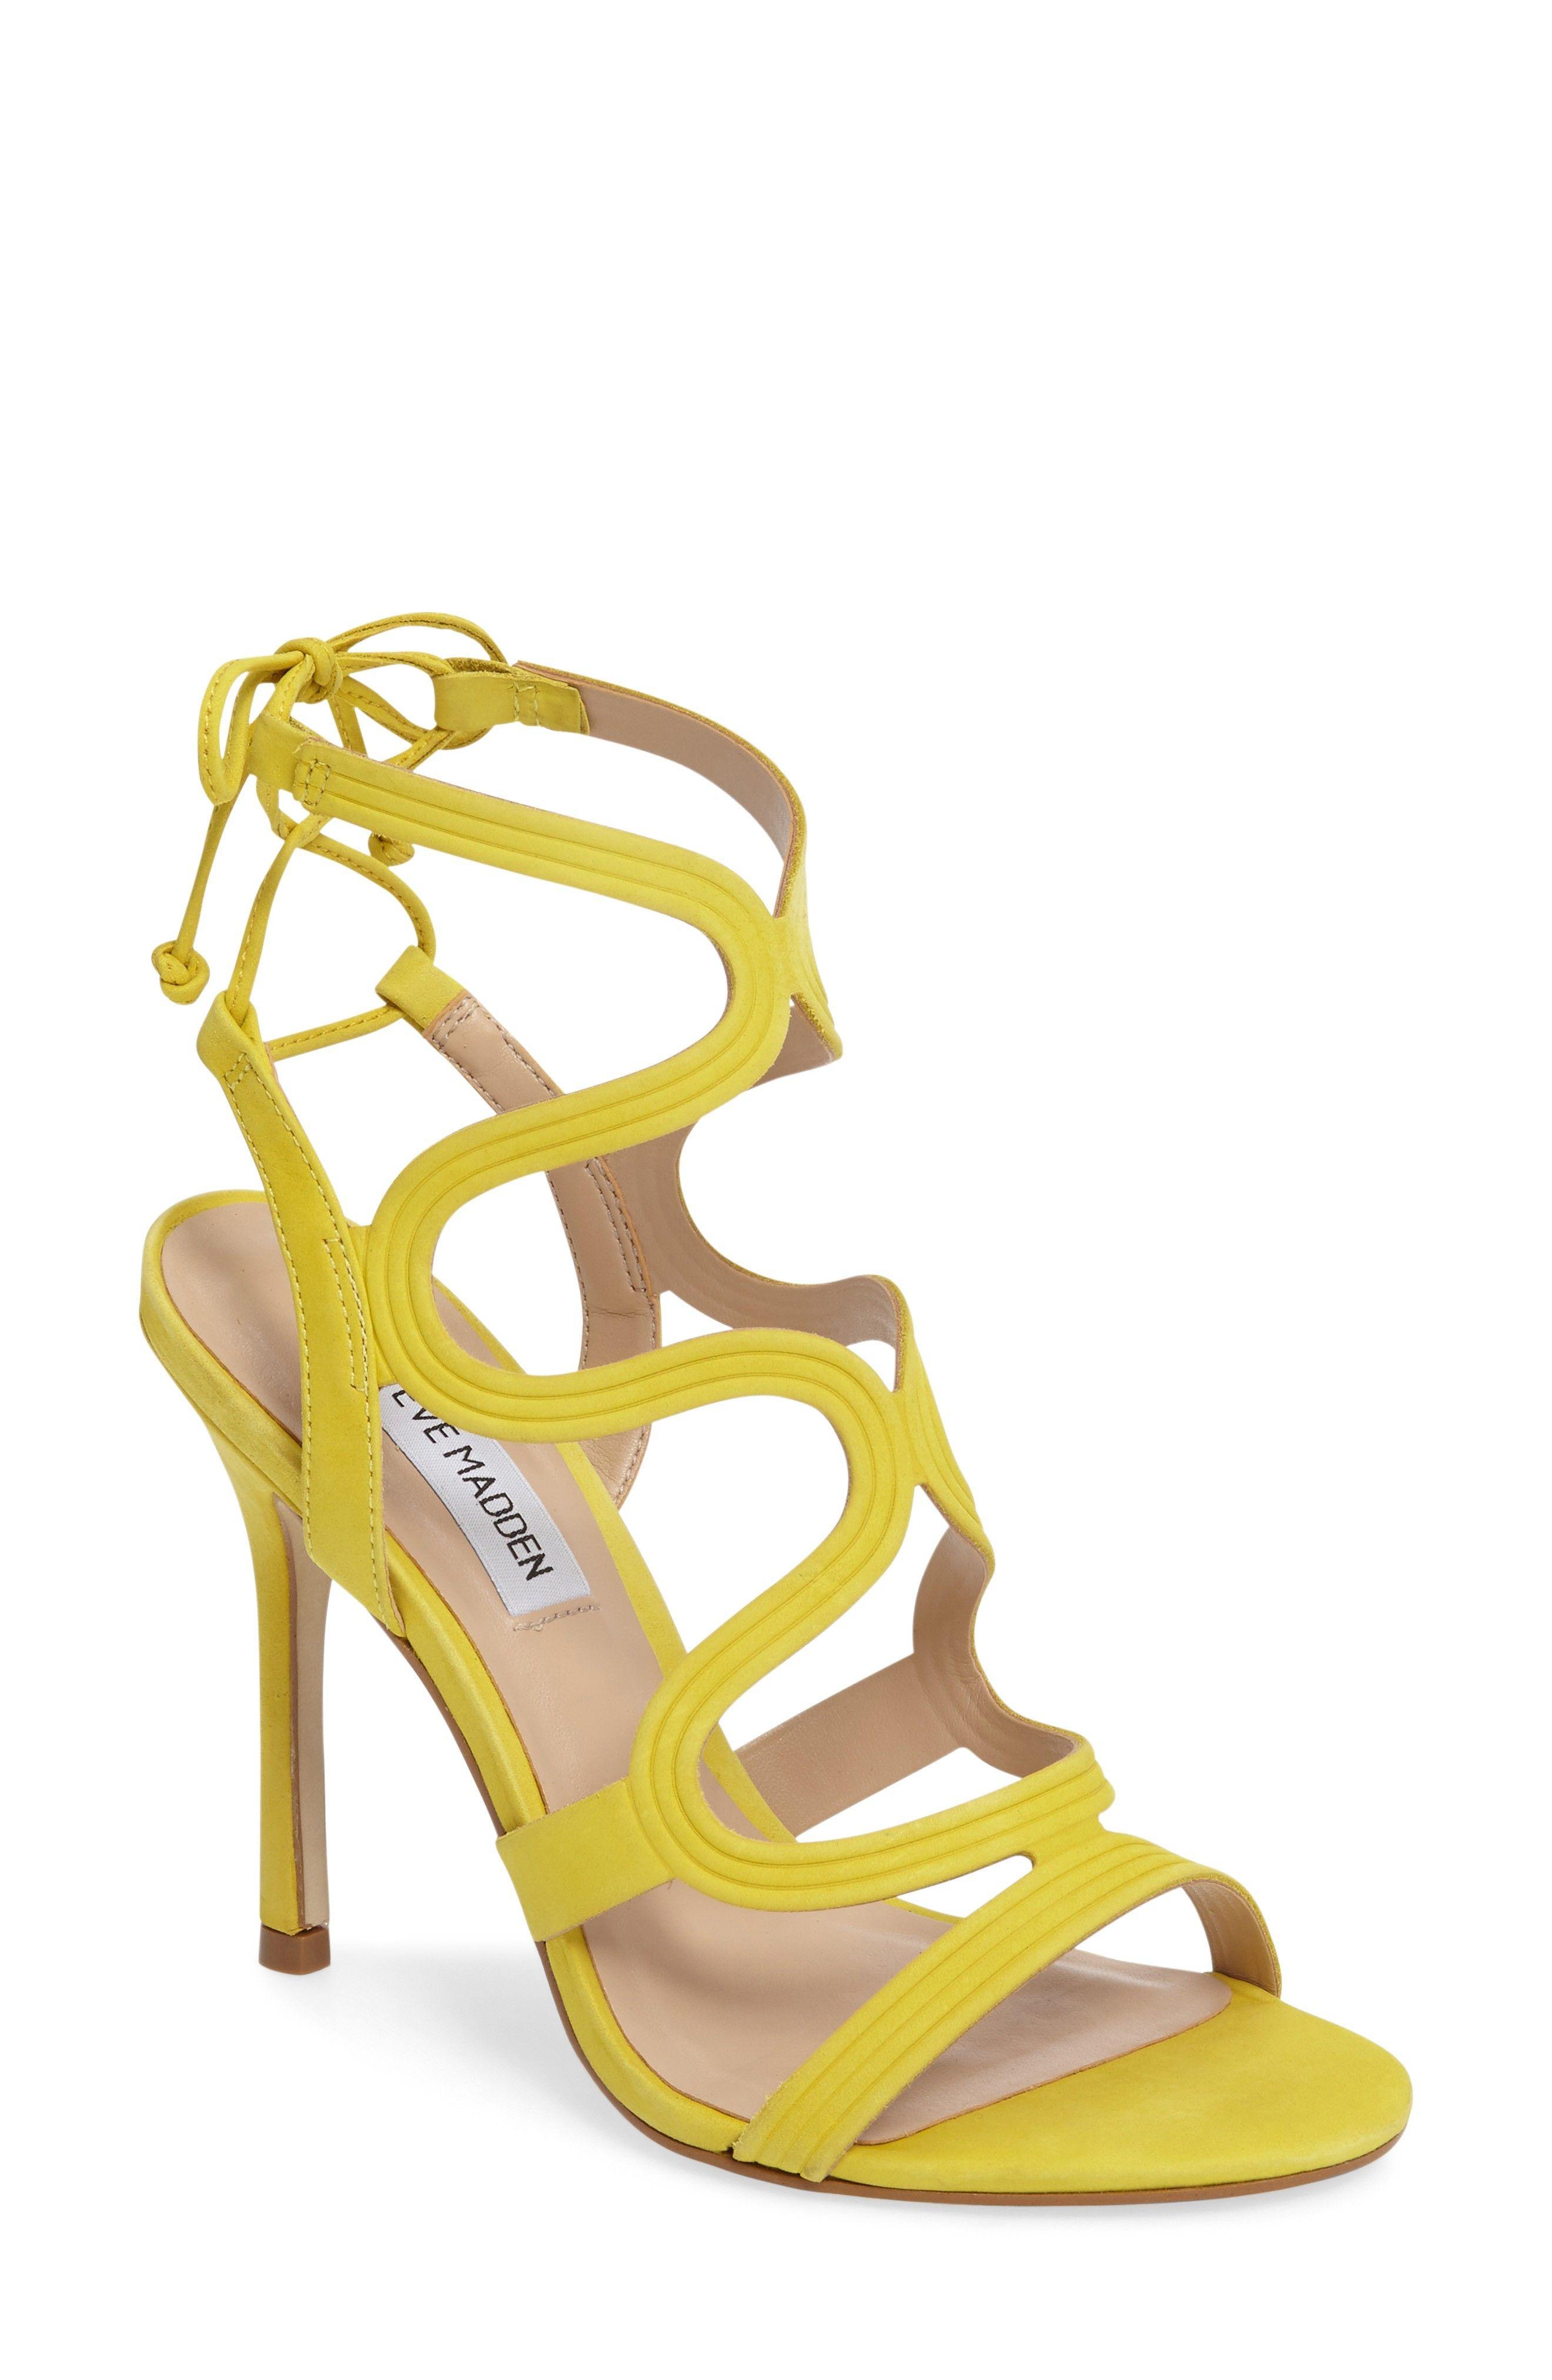 Avau sandal dress pinterest sandals clothes and fashion